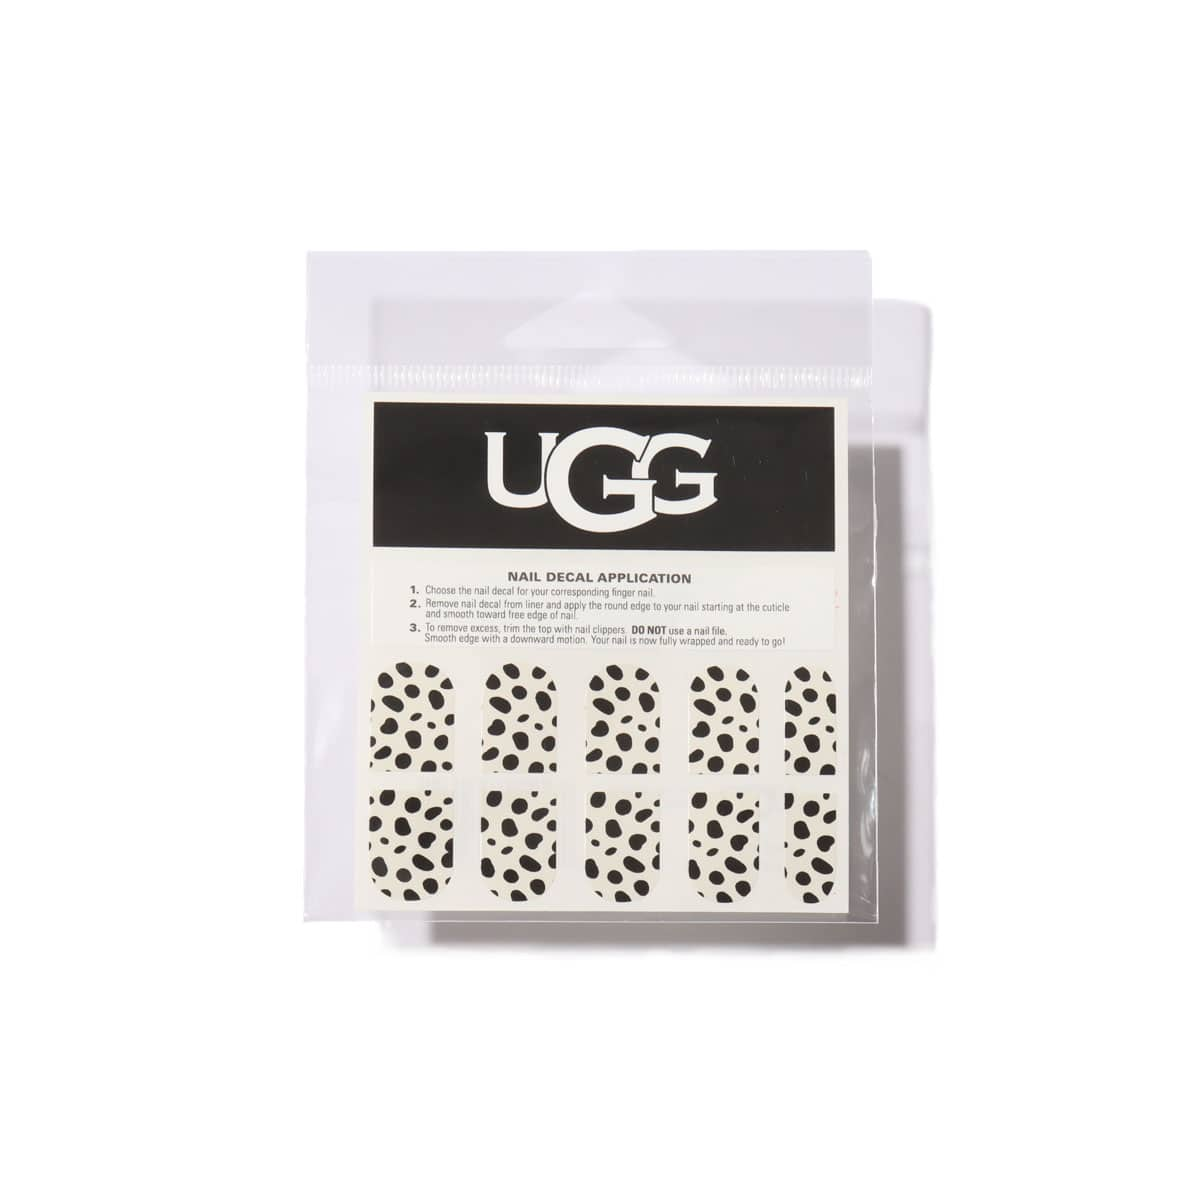 UGG Dalmatian Nail Sticker BLACK/WHITE 20FW-S_photo_large